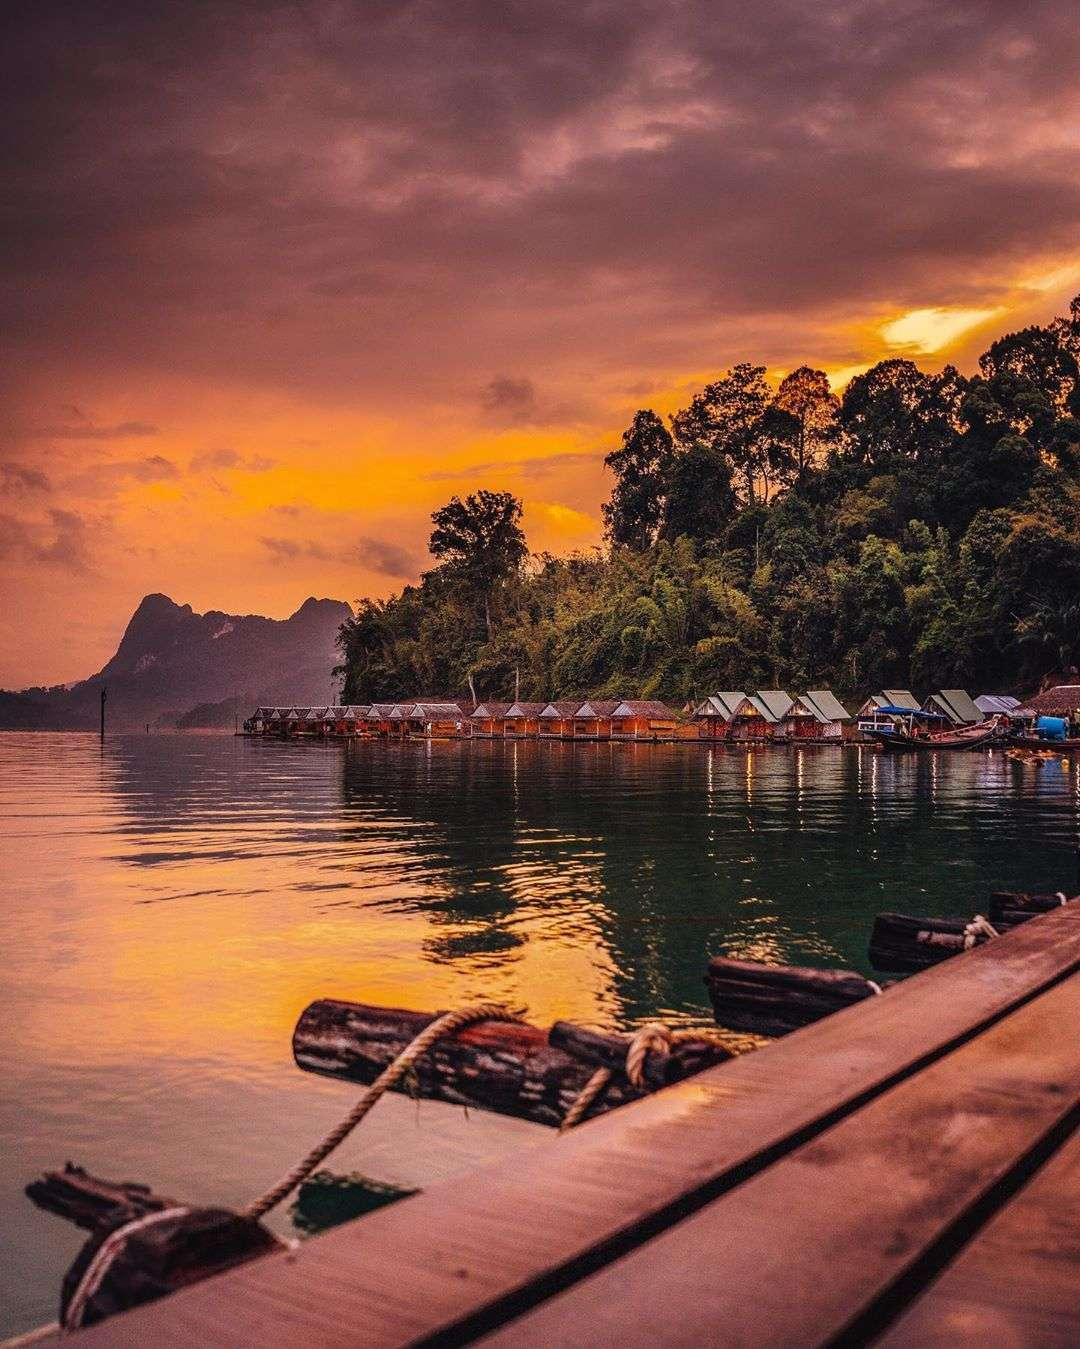 Rafthouses op het Cheow Lan Lake